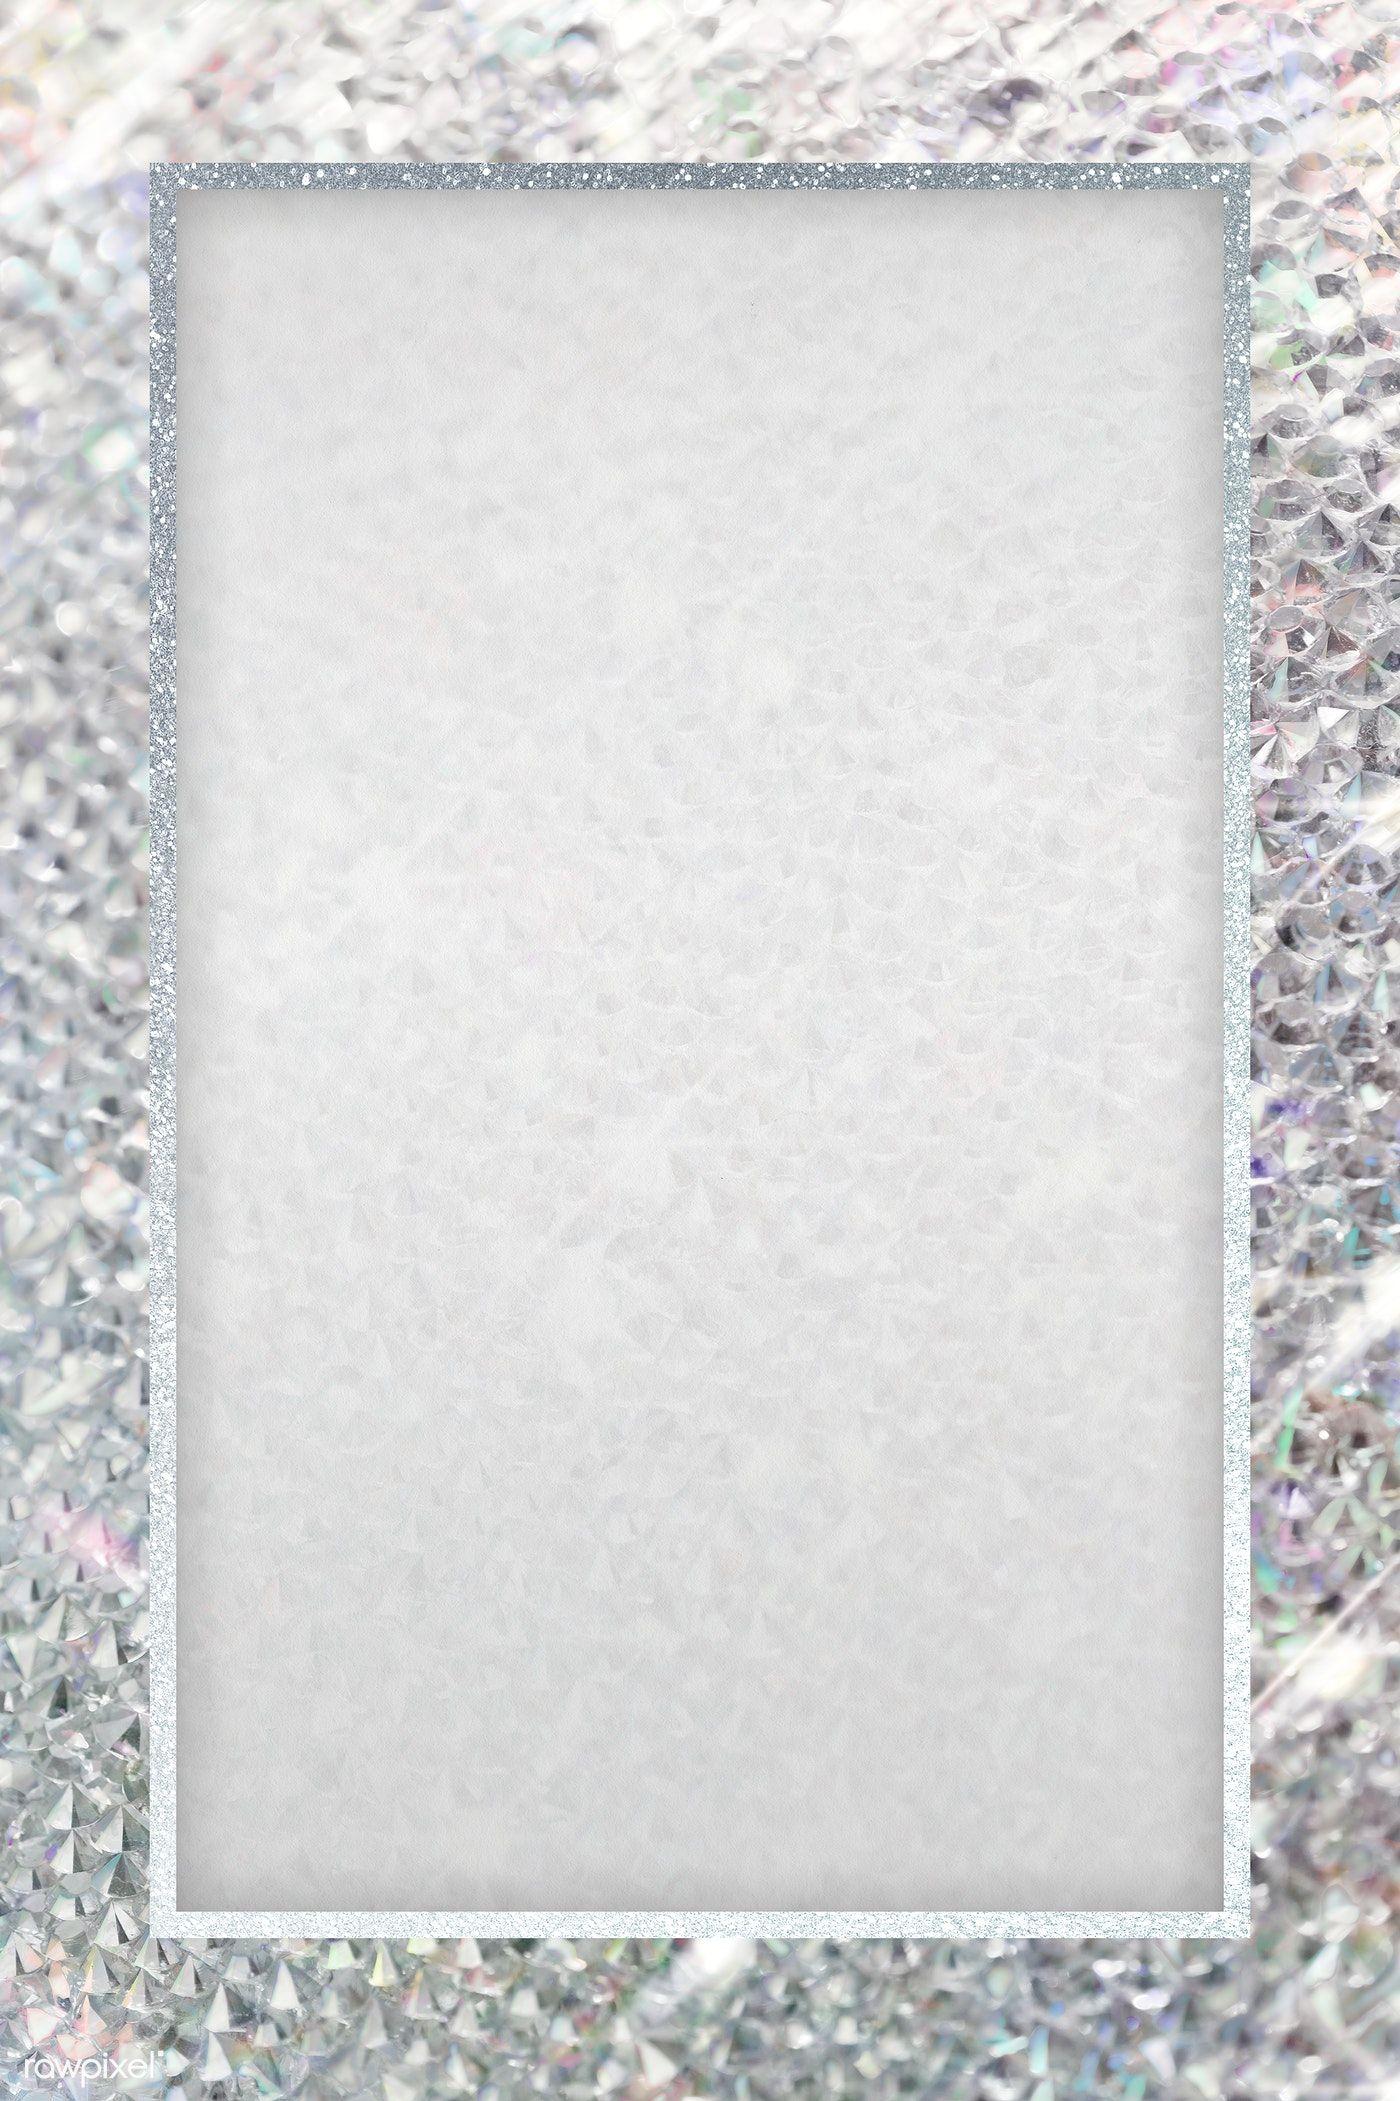 Download Premium Png Of Silver Glittery Rectangle Frame Transparent Png Frame Black Texture Background Gold Frame